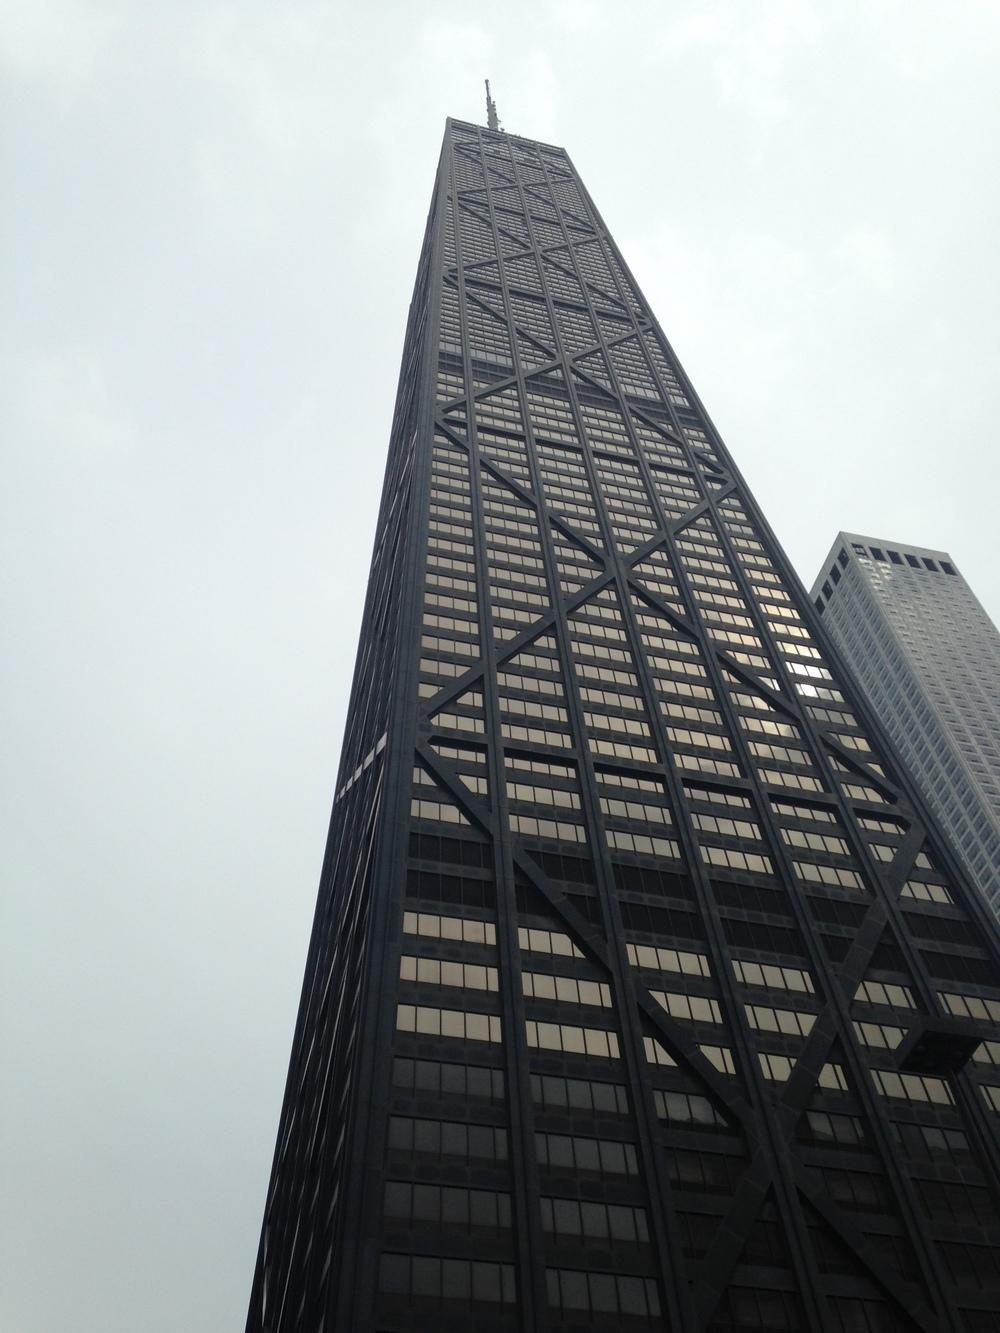 Hancock tower from below